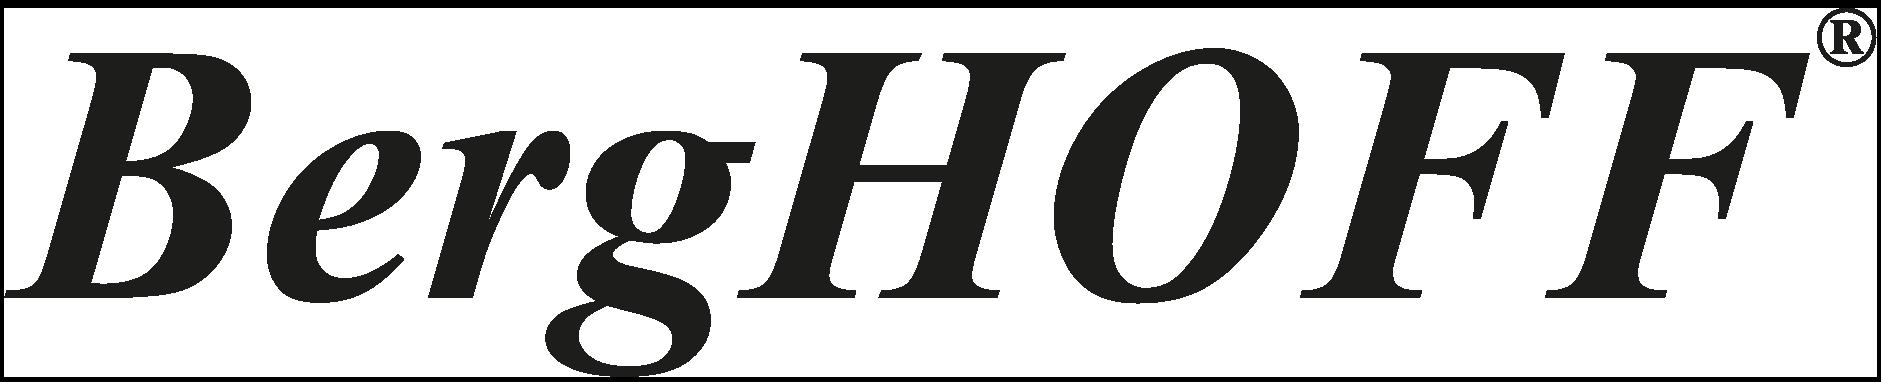 Berghoff Worldwide logo